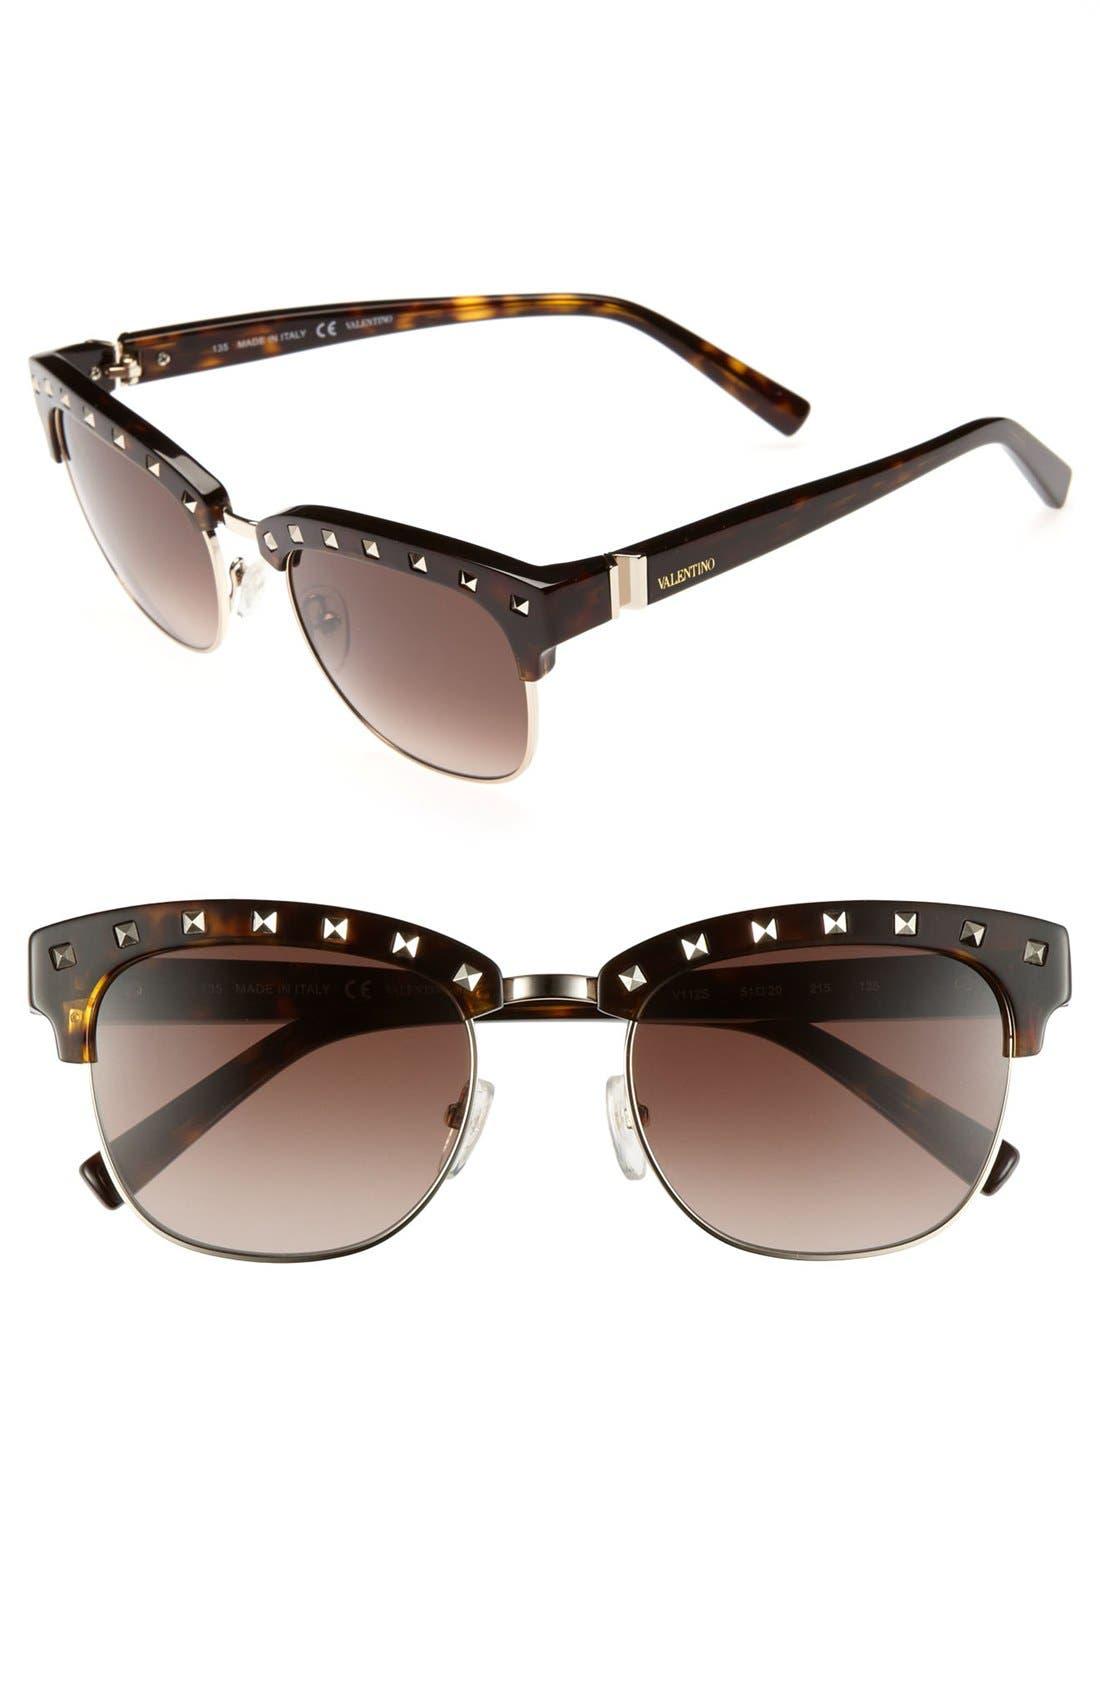 Main Image - Valentino 51mm 'Rockstud' Sunglasses